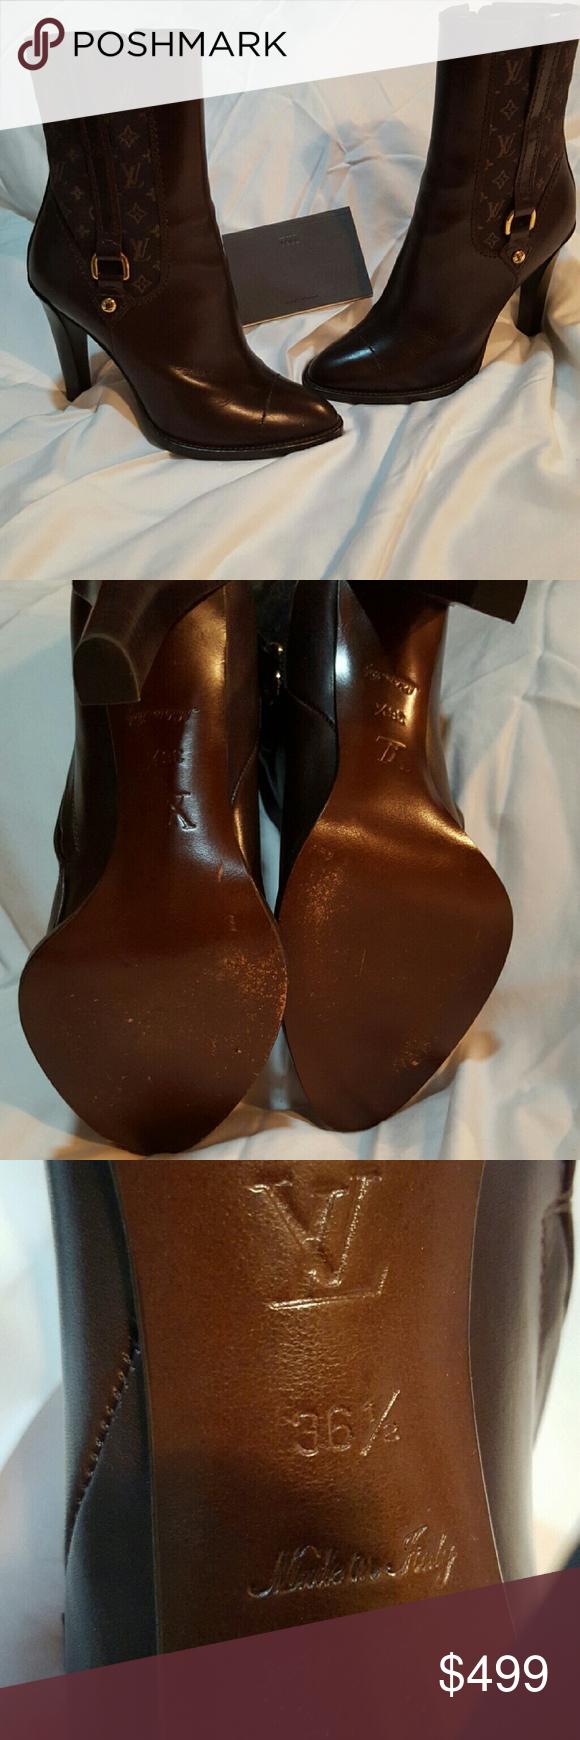 286336bc54df Spotted while shopping on Poshmark  Louis Vuitton Brown Monogram Mini Lin  Canvas Jodie!  poshmark  fashion  shopping  style  Louis Vuitton  Shoes